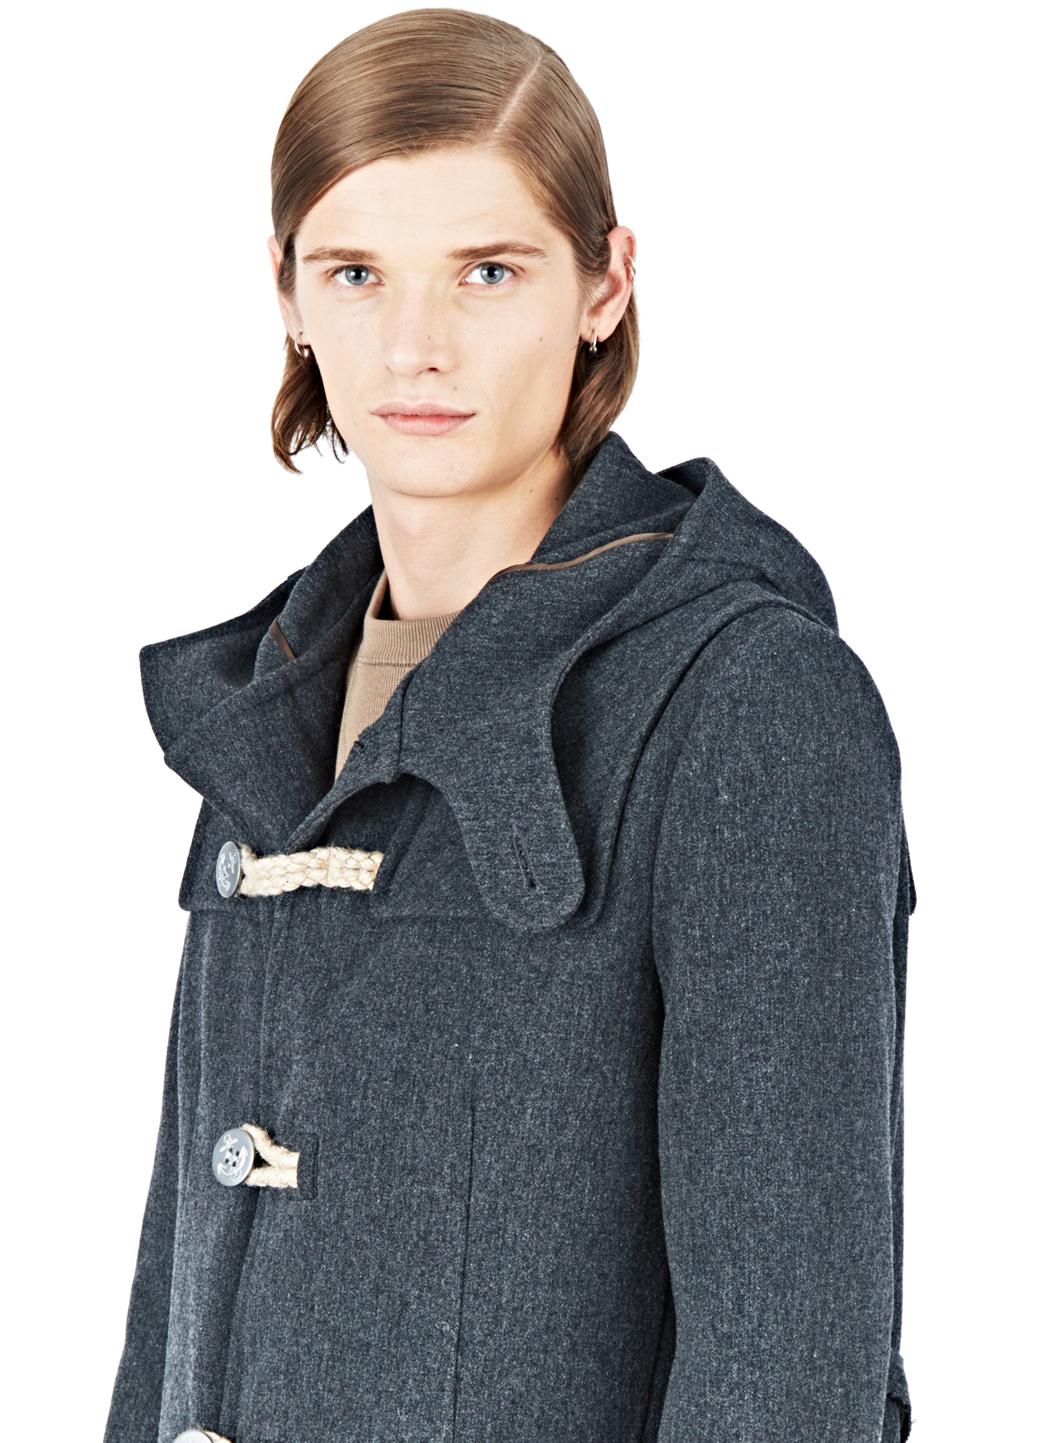 lyst kolor beacon wool duffle coat in gray for men. Black Bedroom Furniture Sets. Home Design Ideas